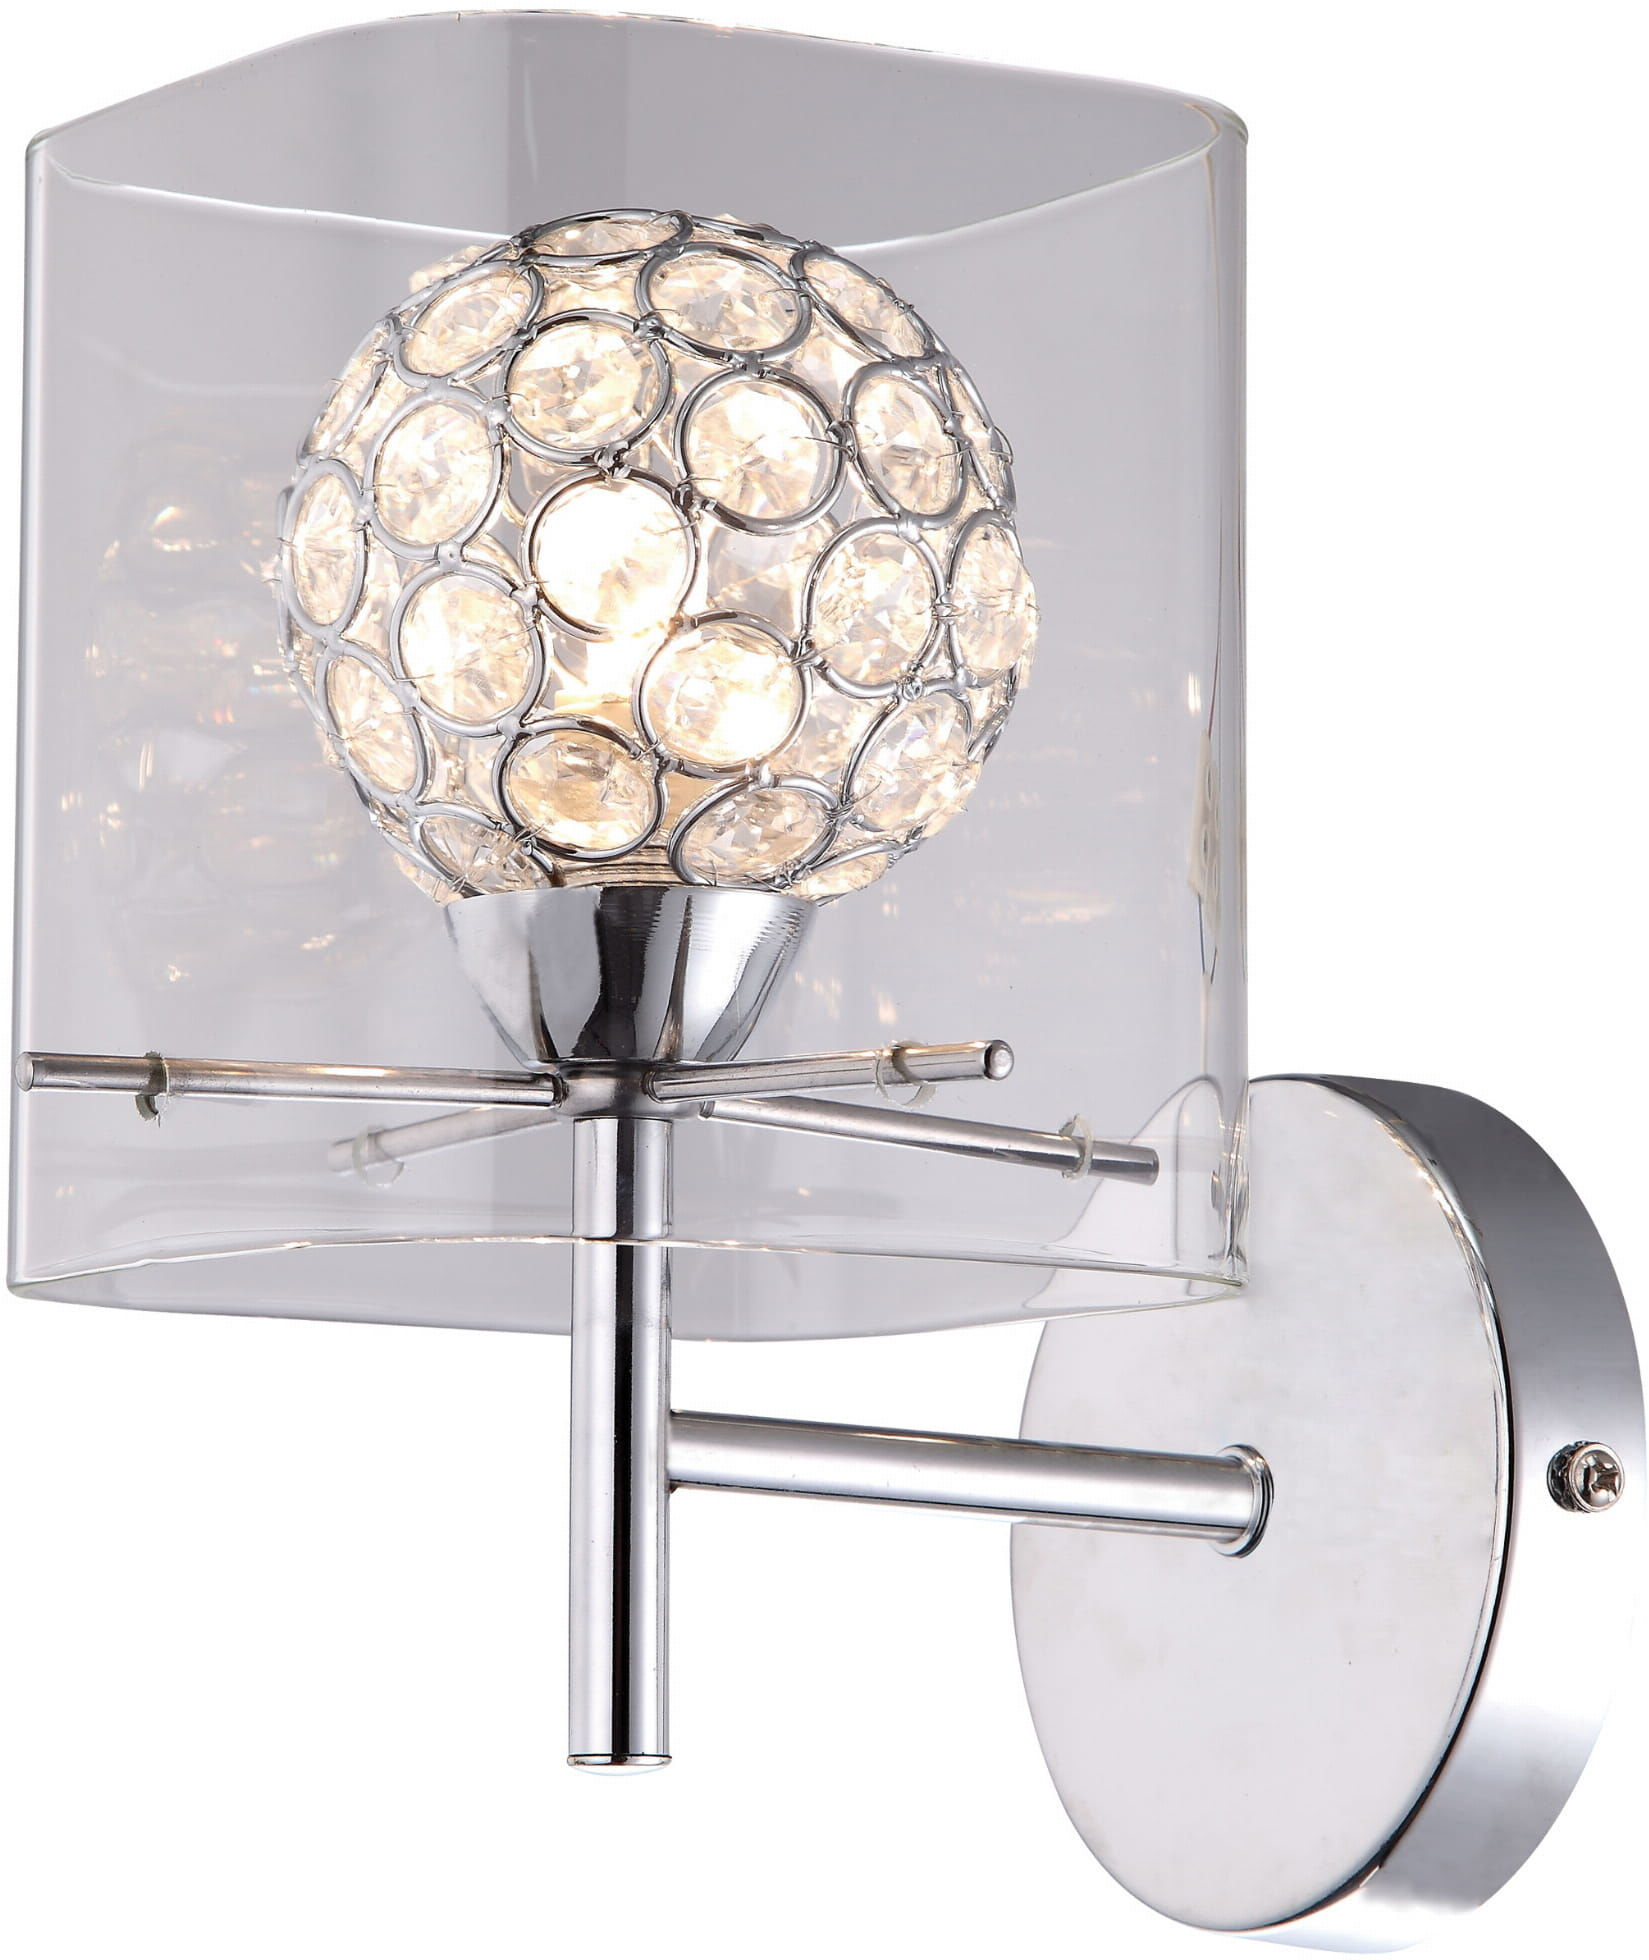 Light Prestige Spark LP-5193/1W transp kinkiet lampa ścienna transparentna klosz kula 1x33W G9 13cm